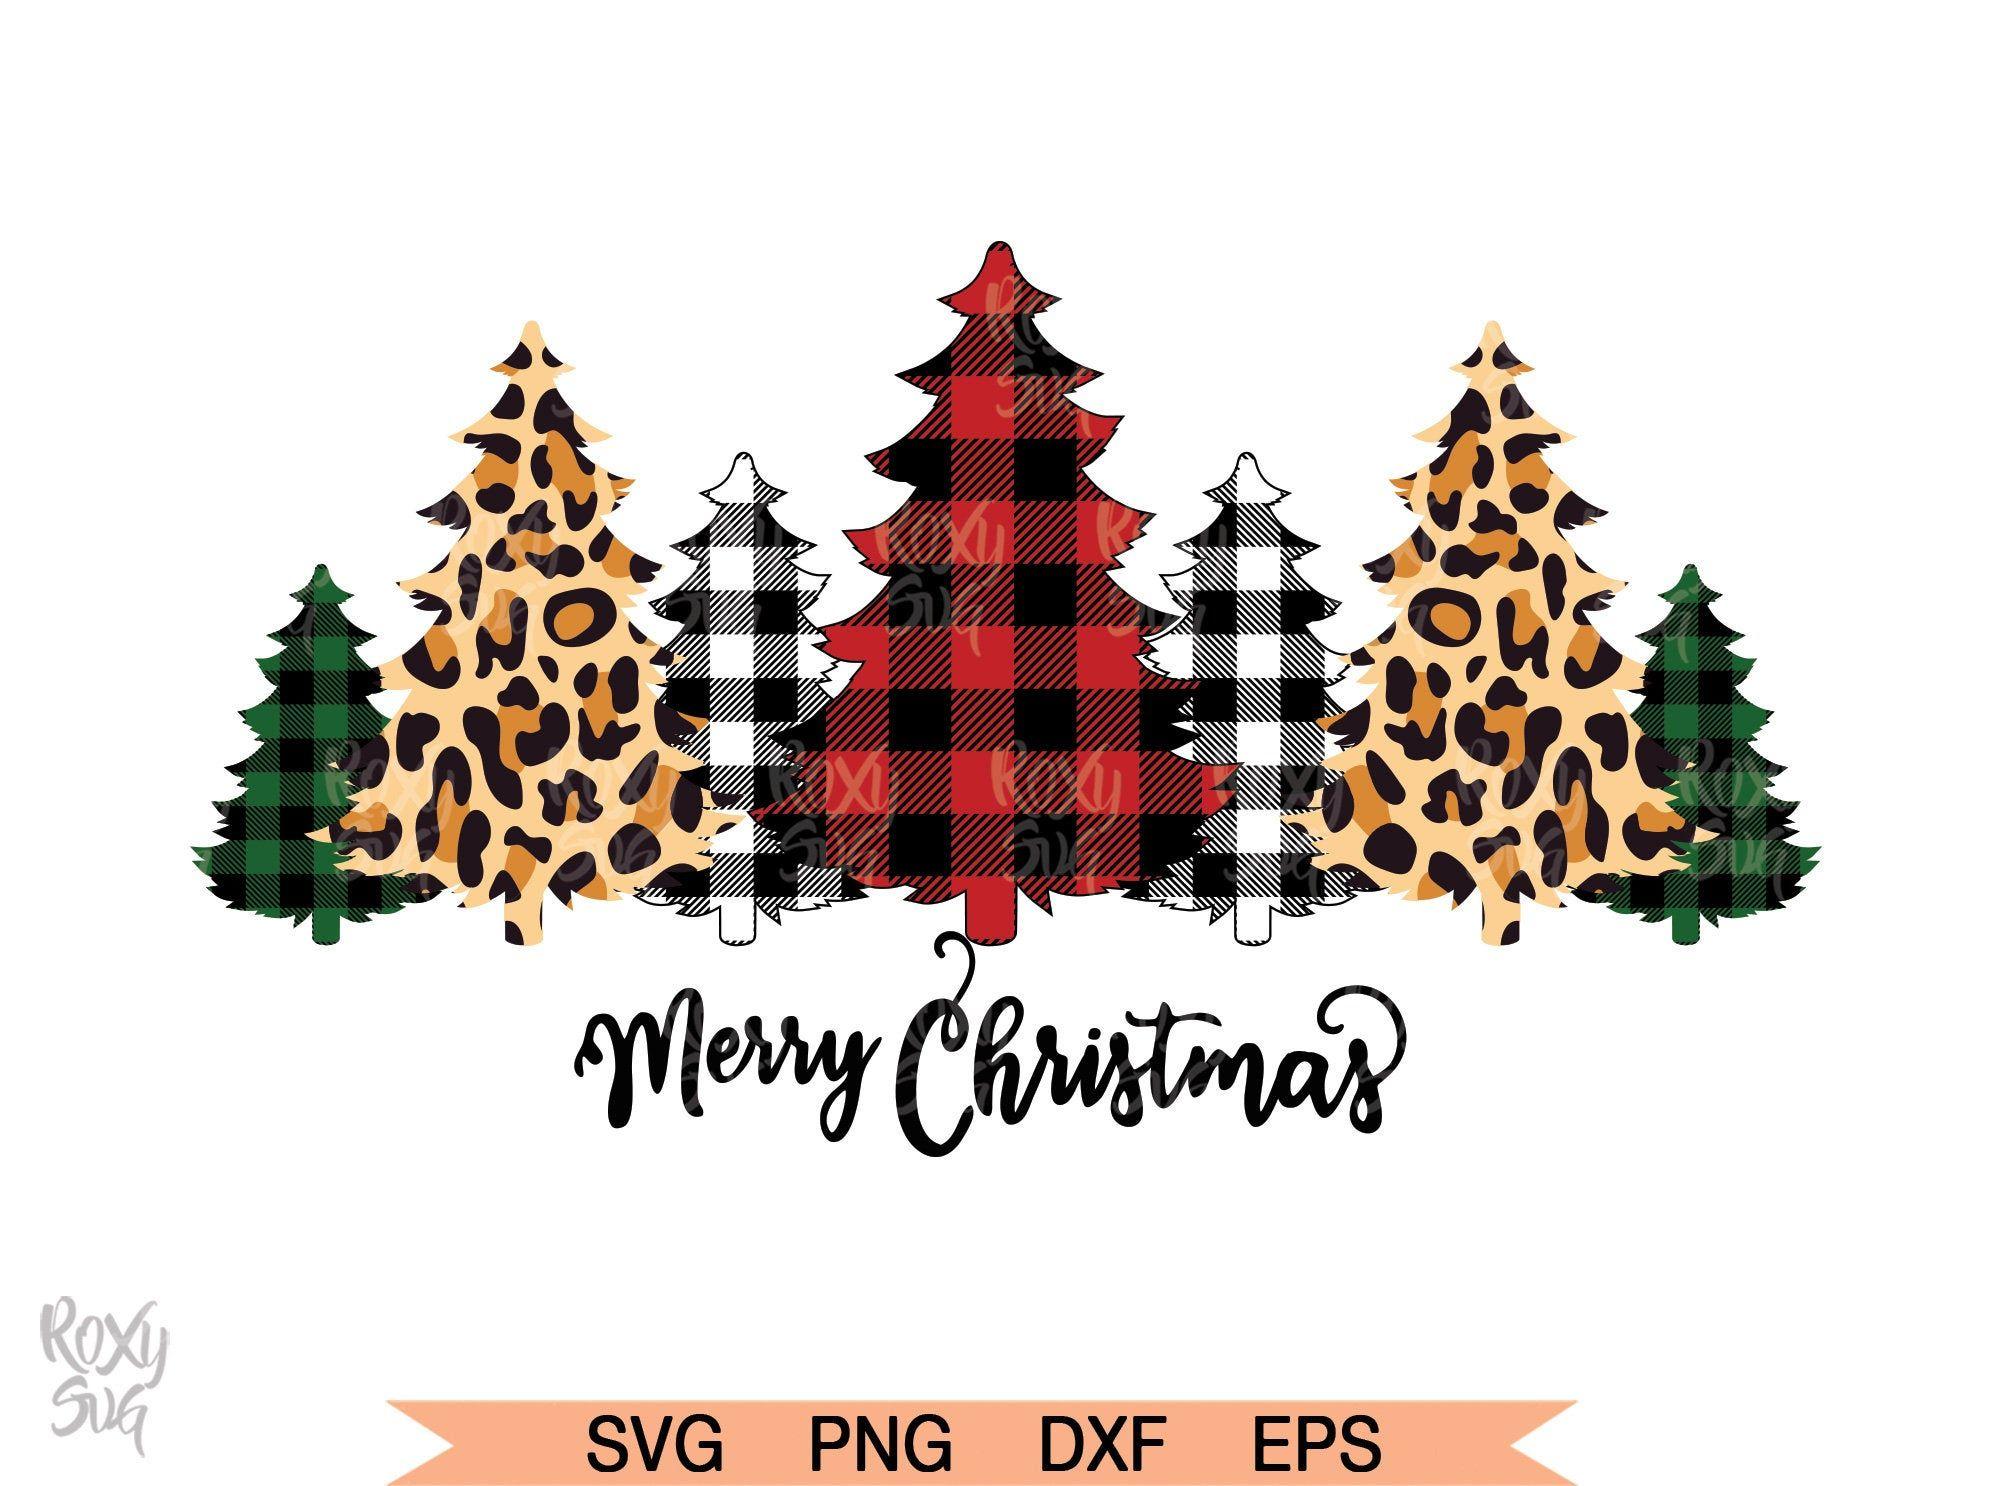 Buffalo Plaid Trees Svg Christmas Tree Svg Christmas Svg Etsy In 2020 Christmas Tree Clipart Christmas Svg Christmas Svg Files